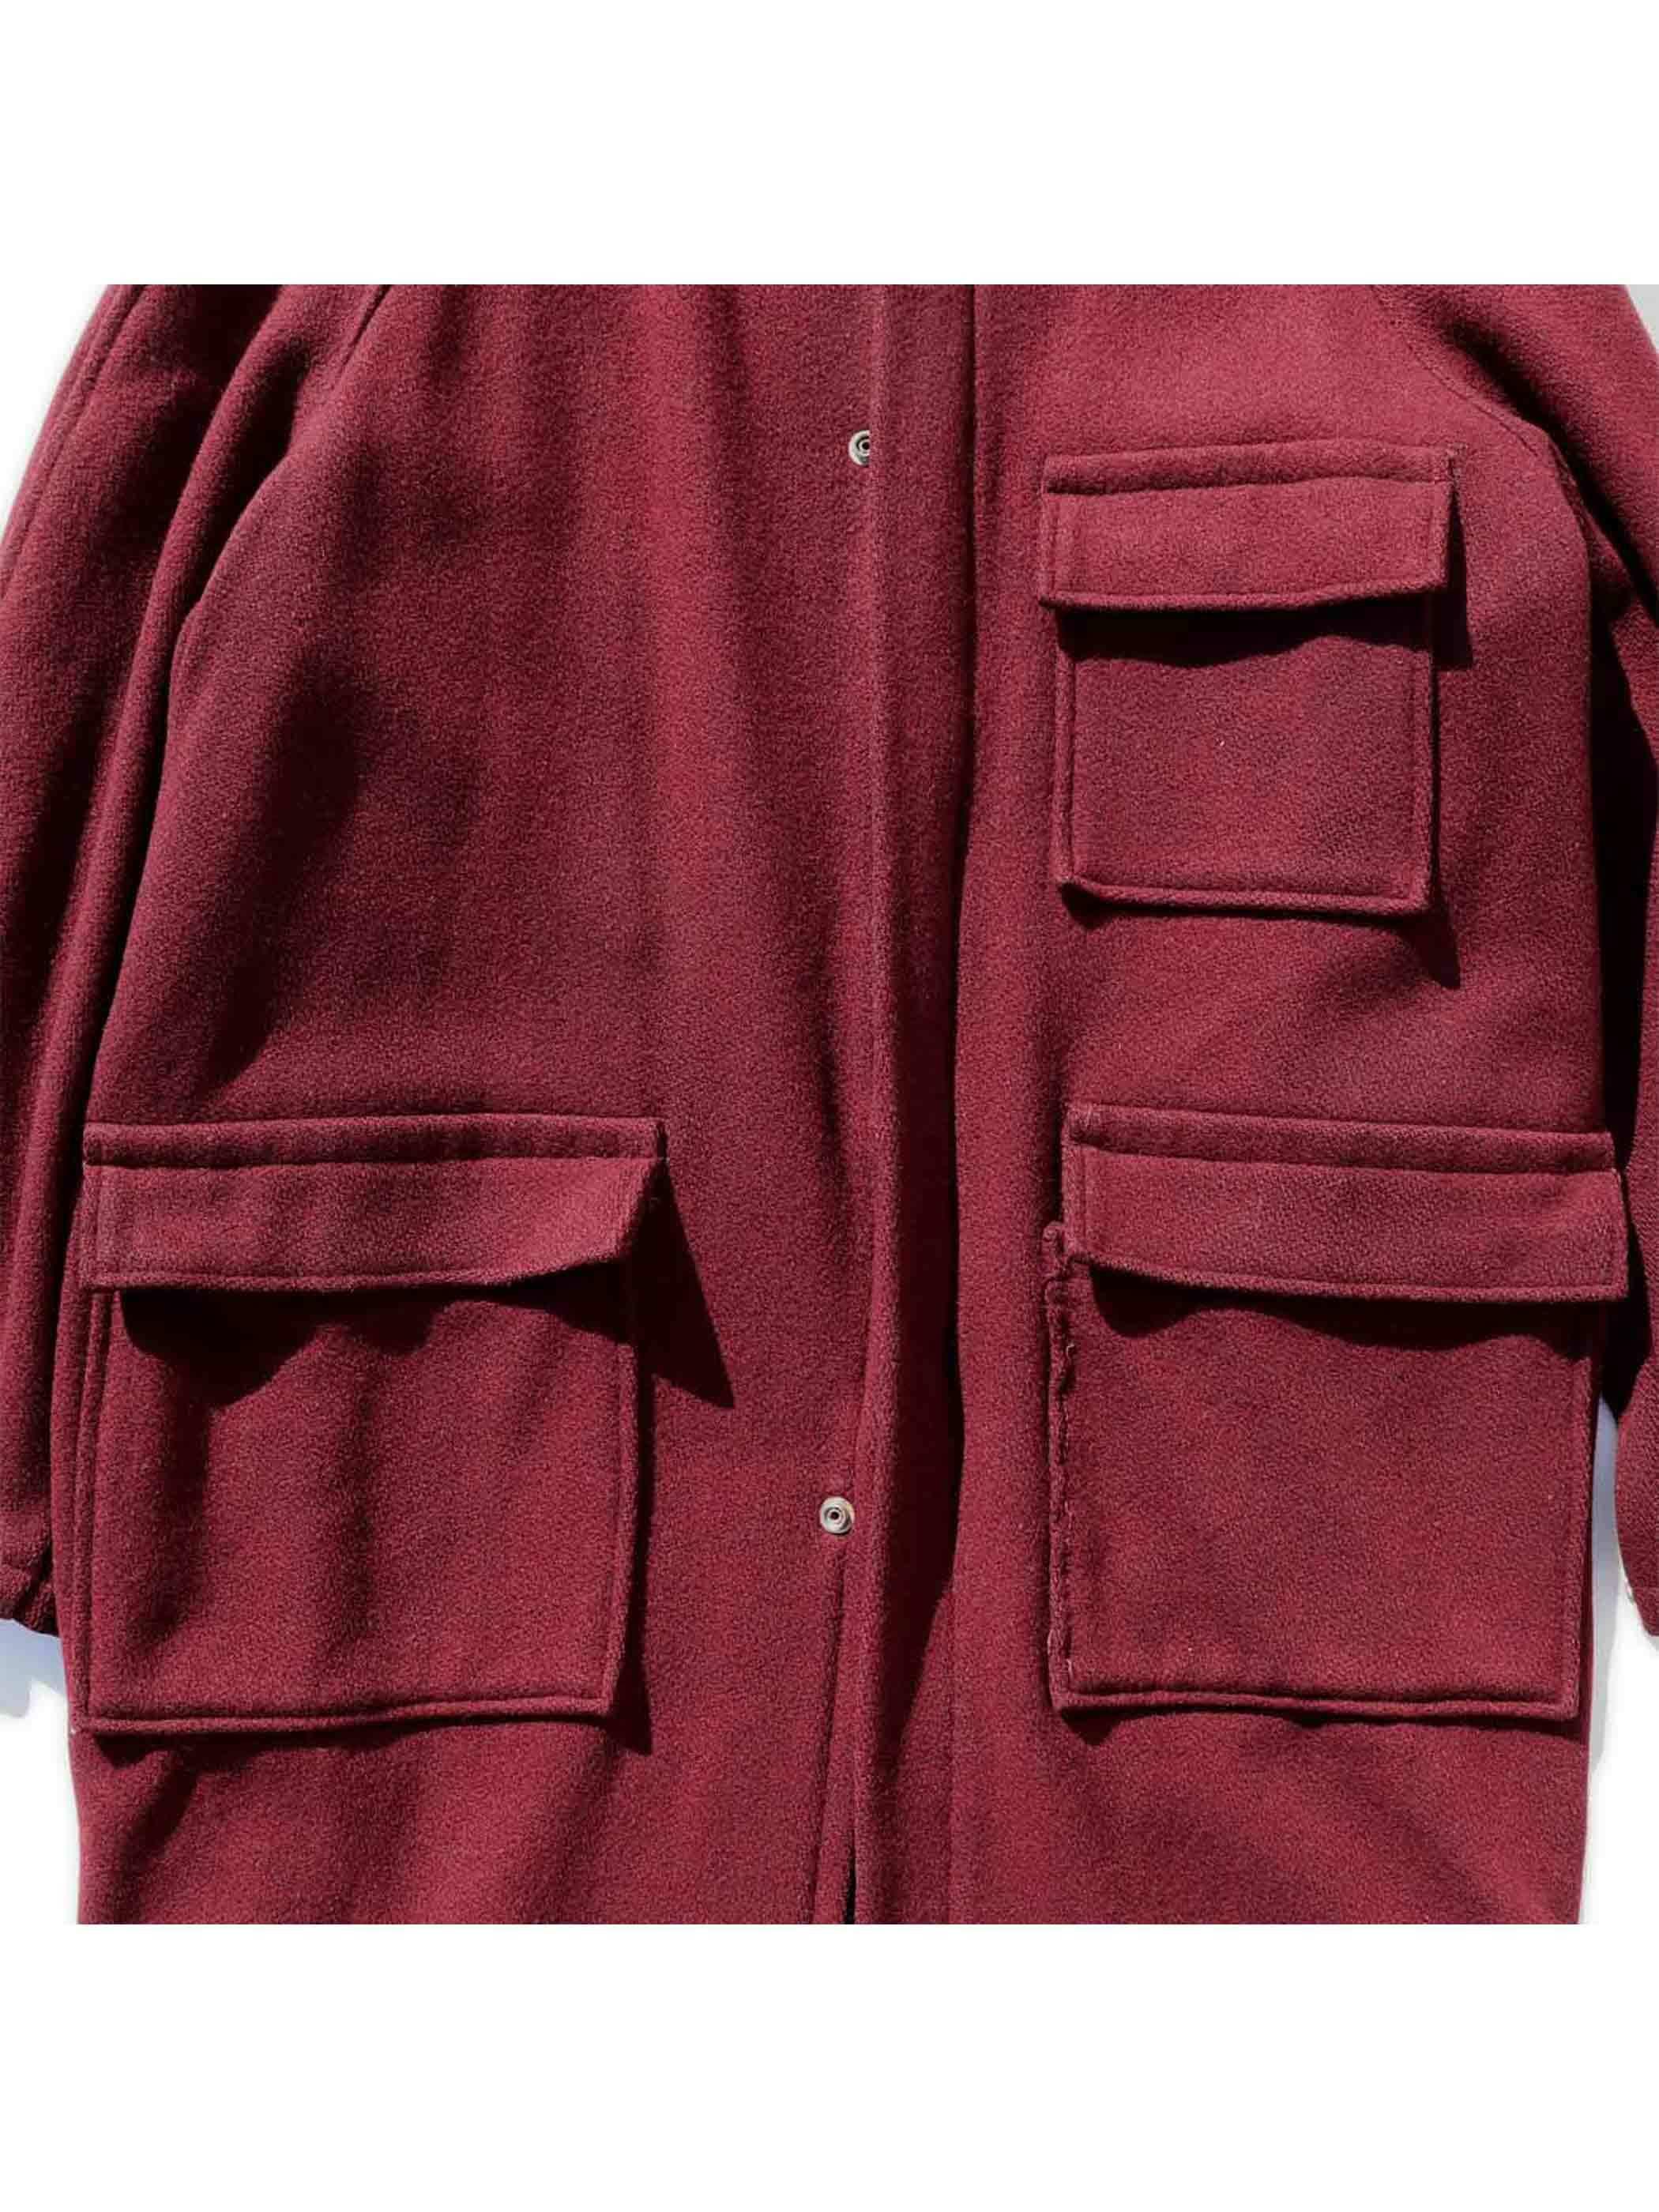 60's STANDARD OF HOLLYWOOD ウール フーデッドコート [42]